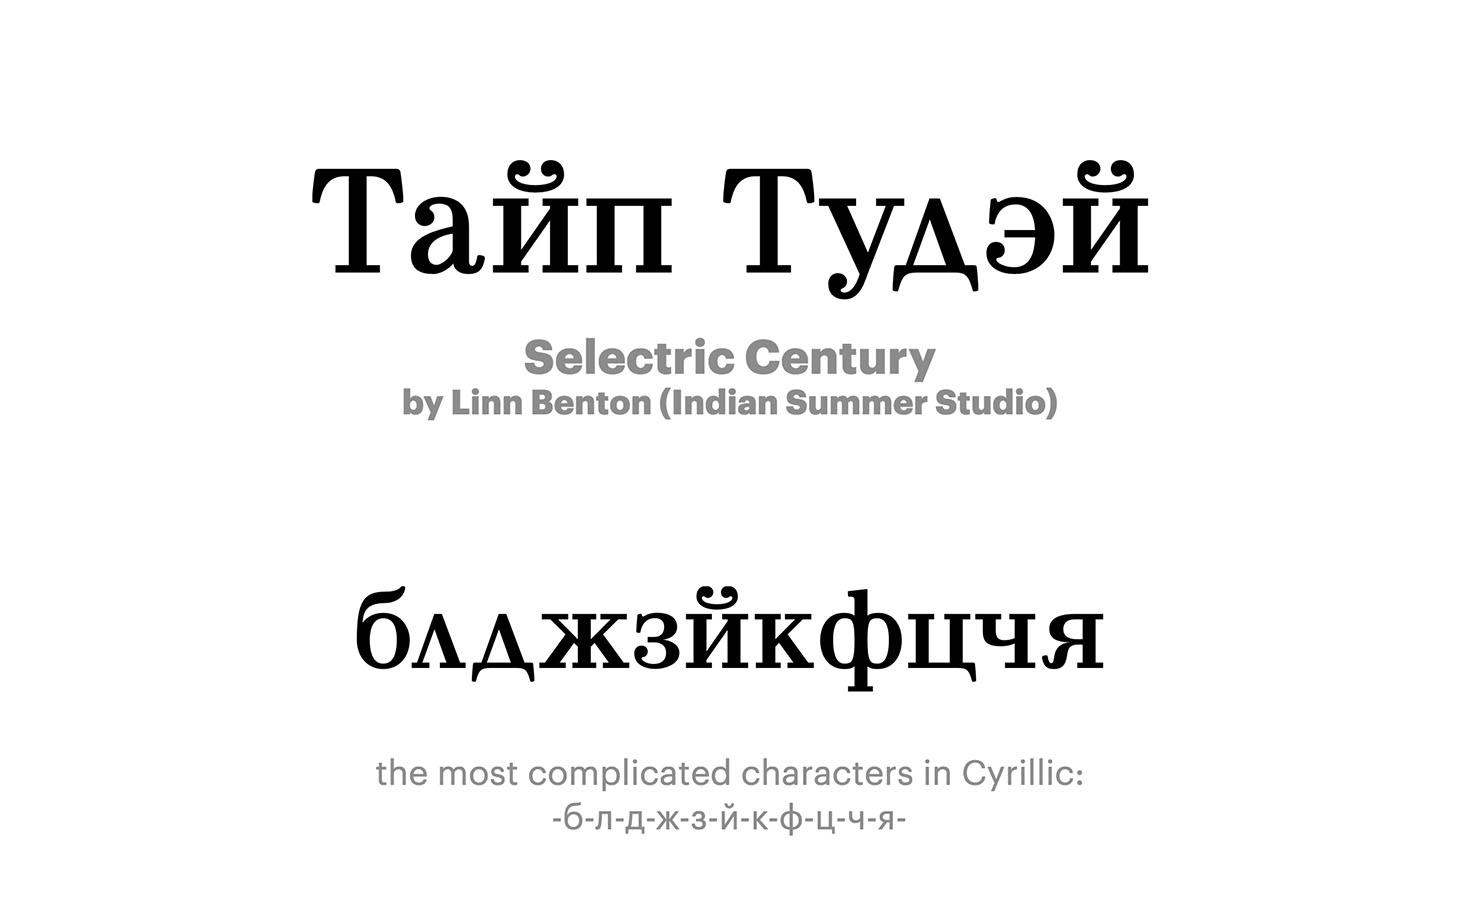 Selectric-Century